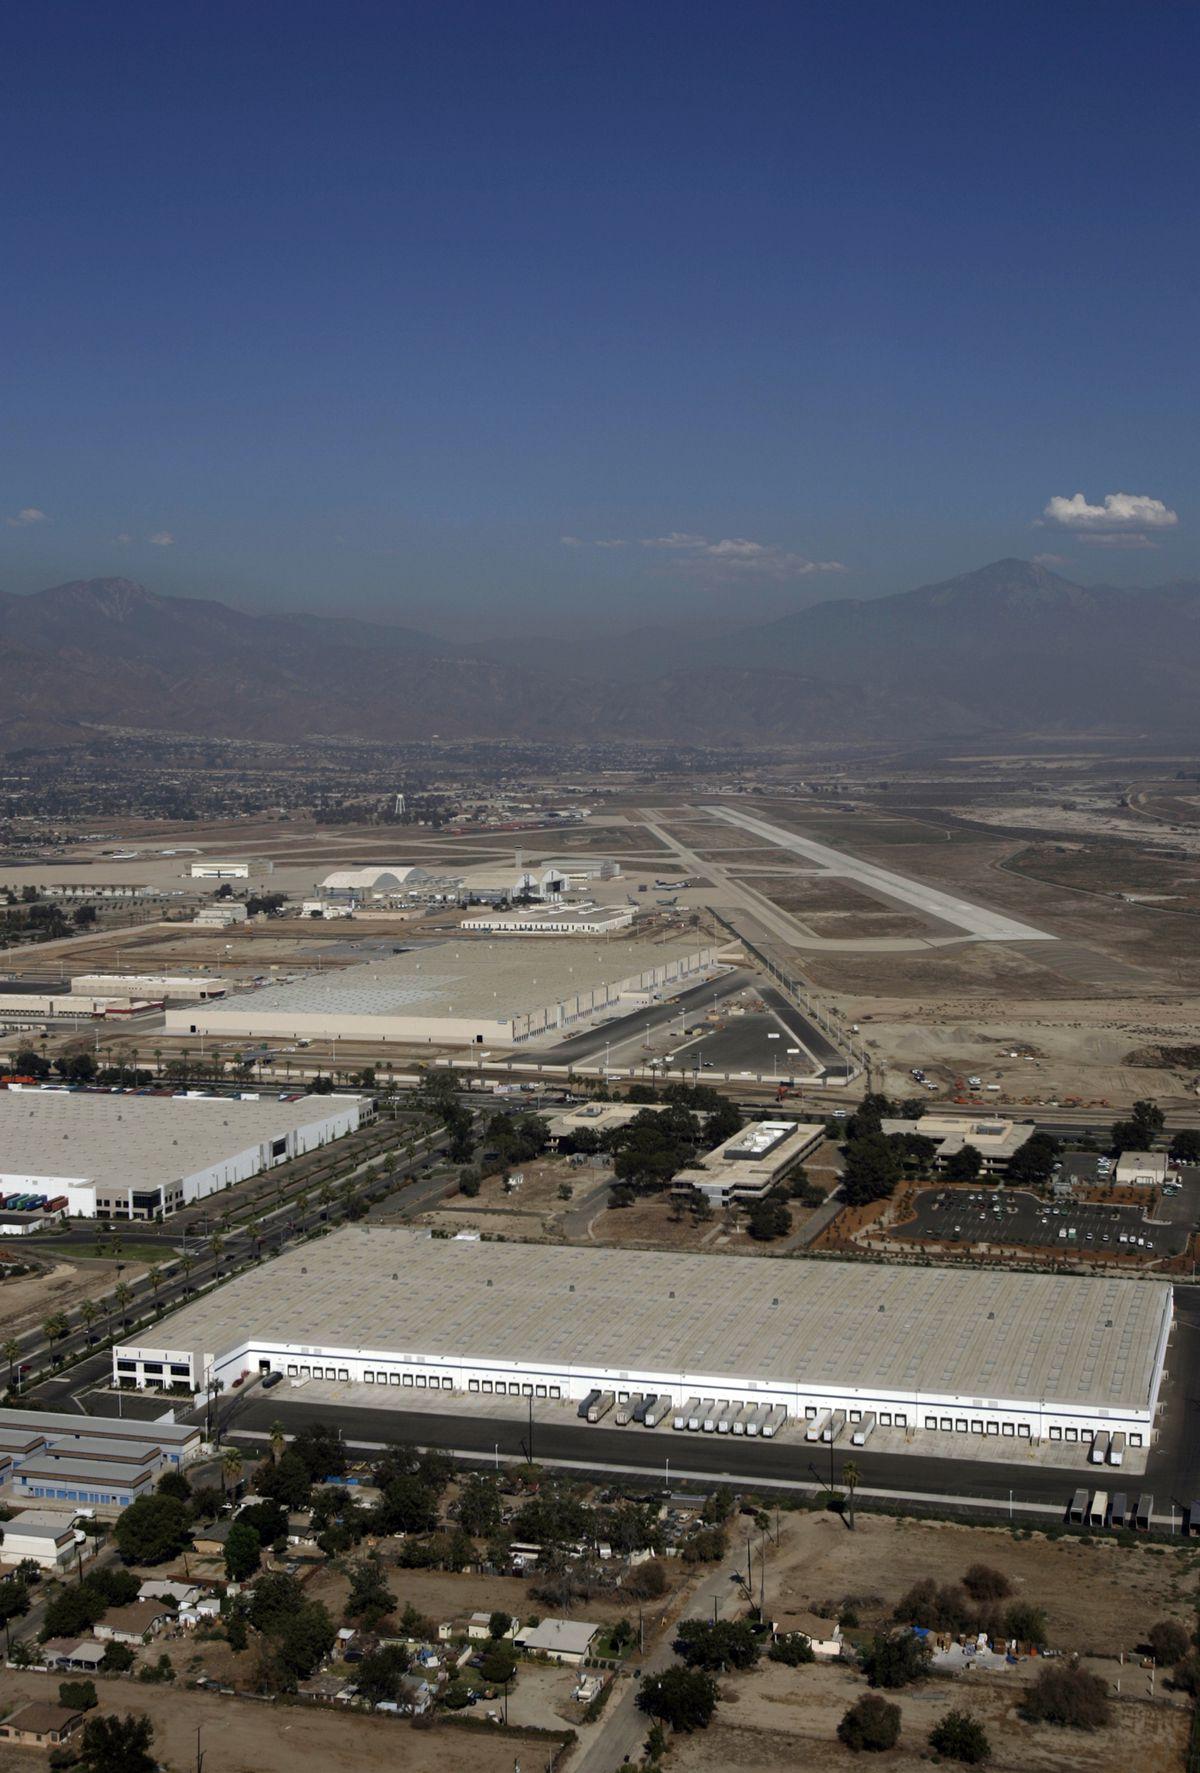 San Bernardino, Sept.07, 2007. An aerial view of San Bernardino International Airport which ha